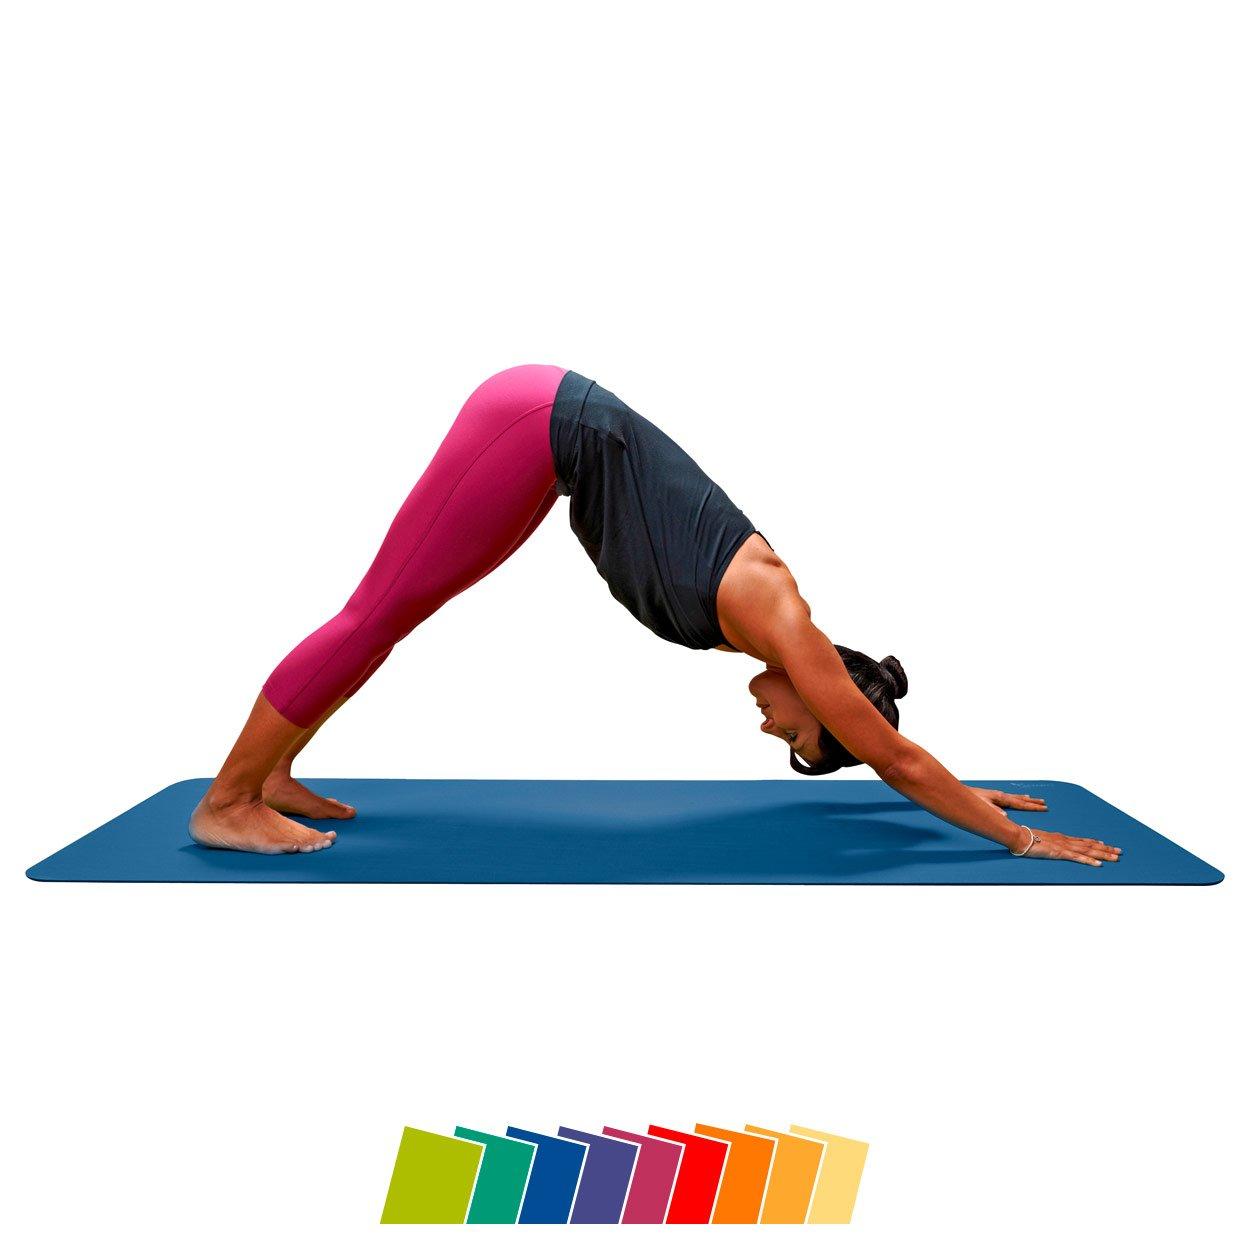 AIREX CALYANA Prime Sportmatte, Pilatesmatte, Turnmatte, Fitnessmatte, Gymnastik